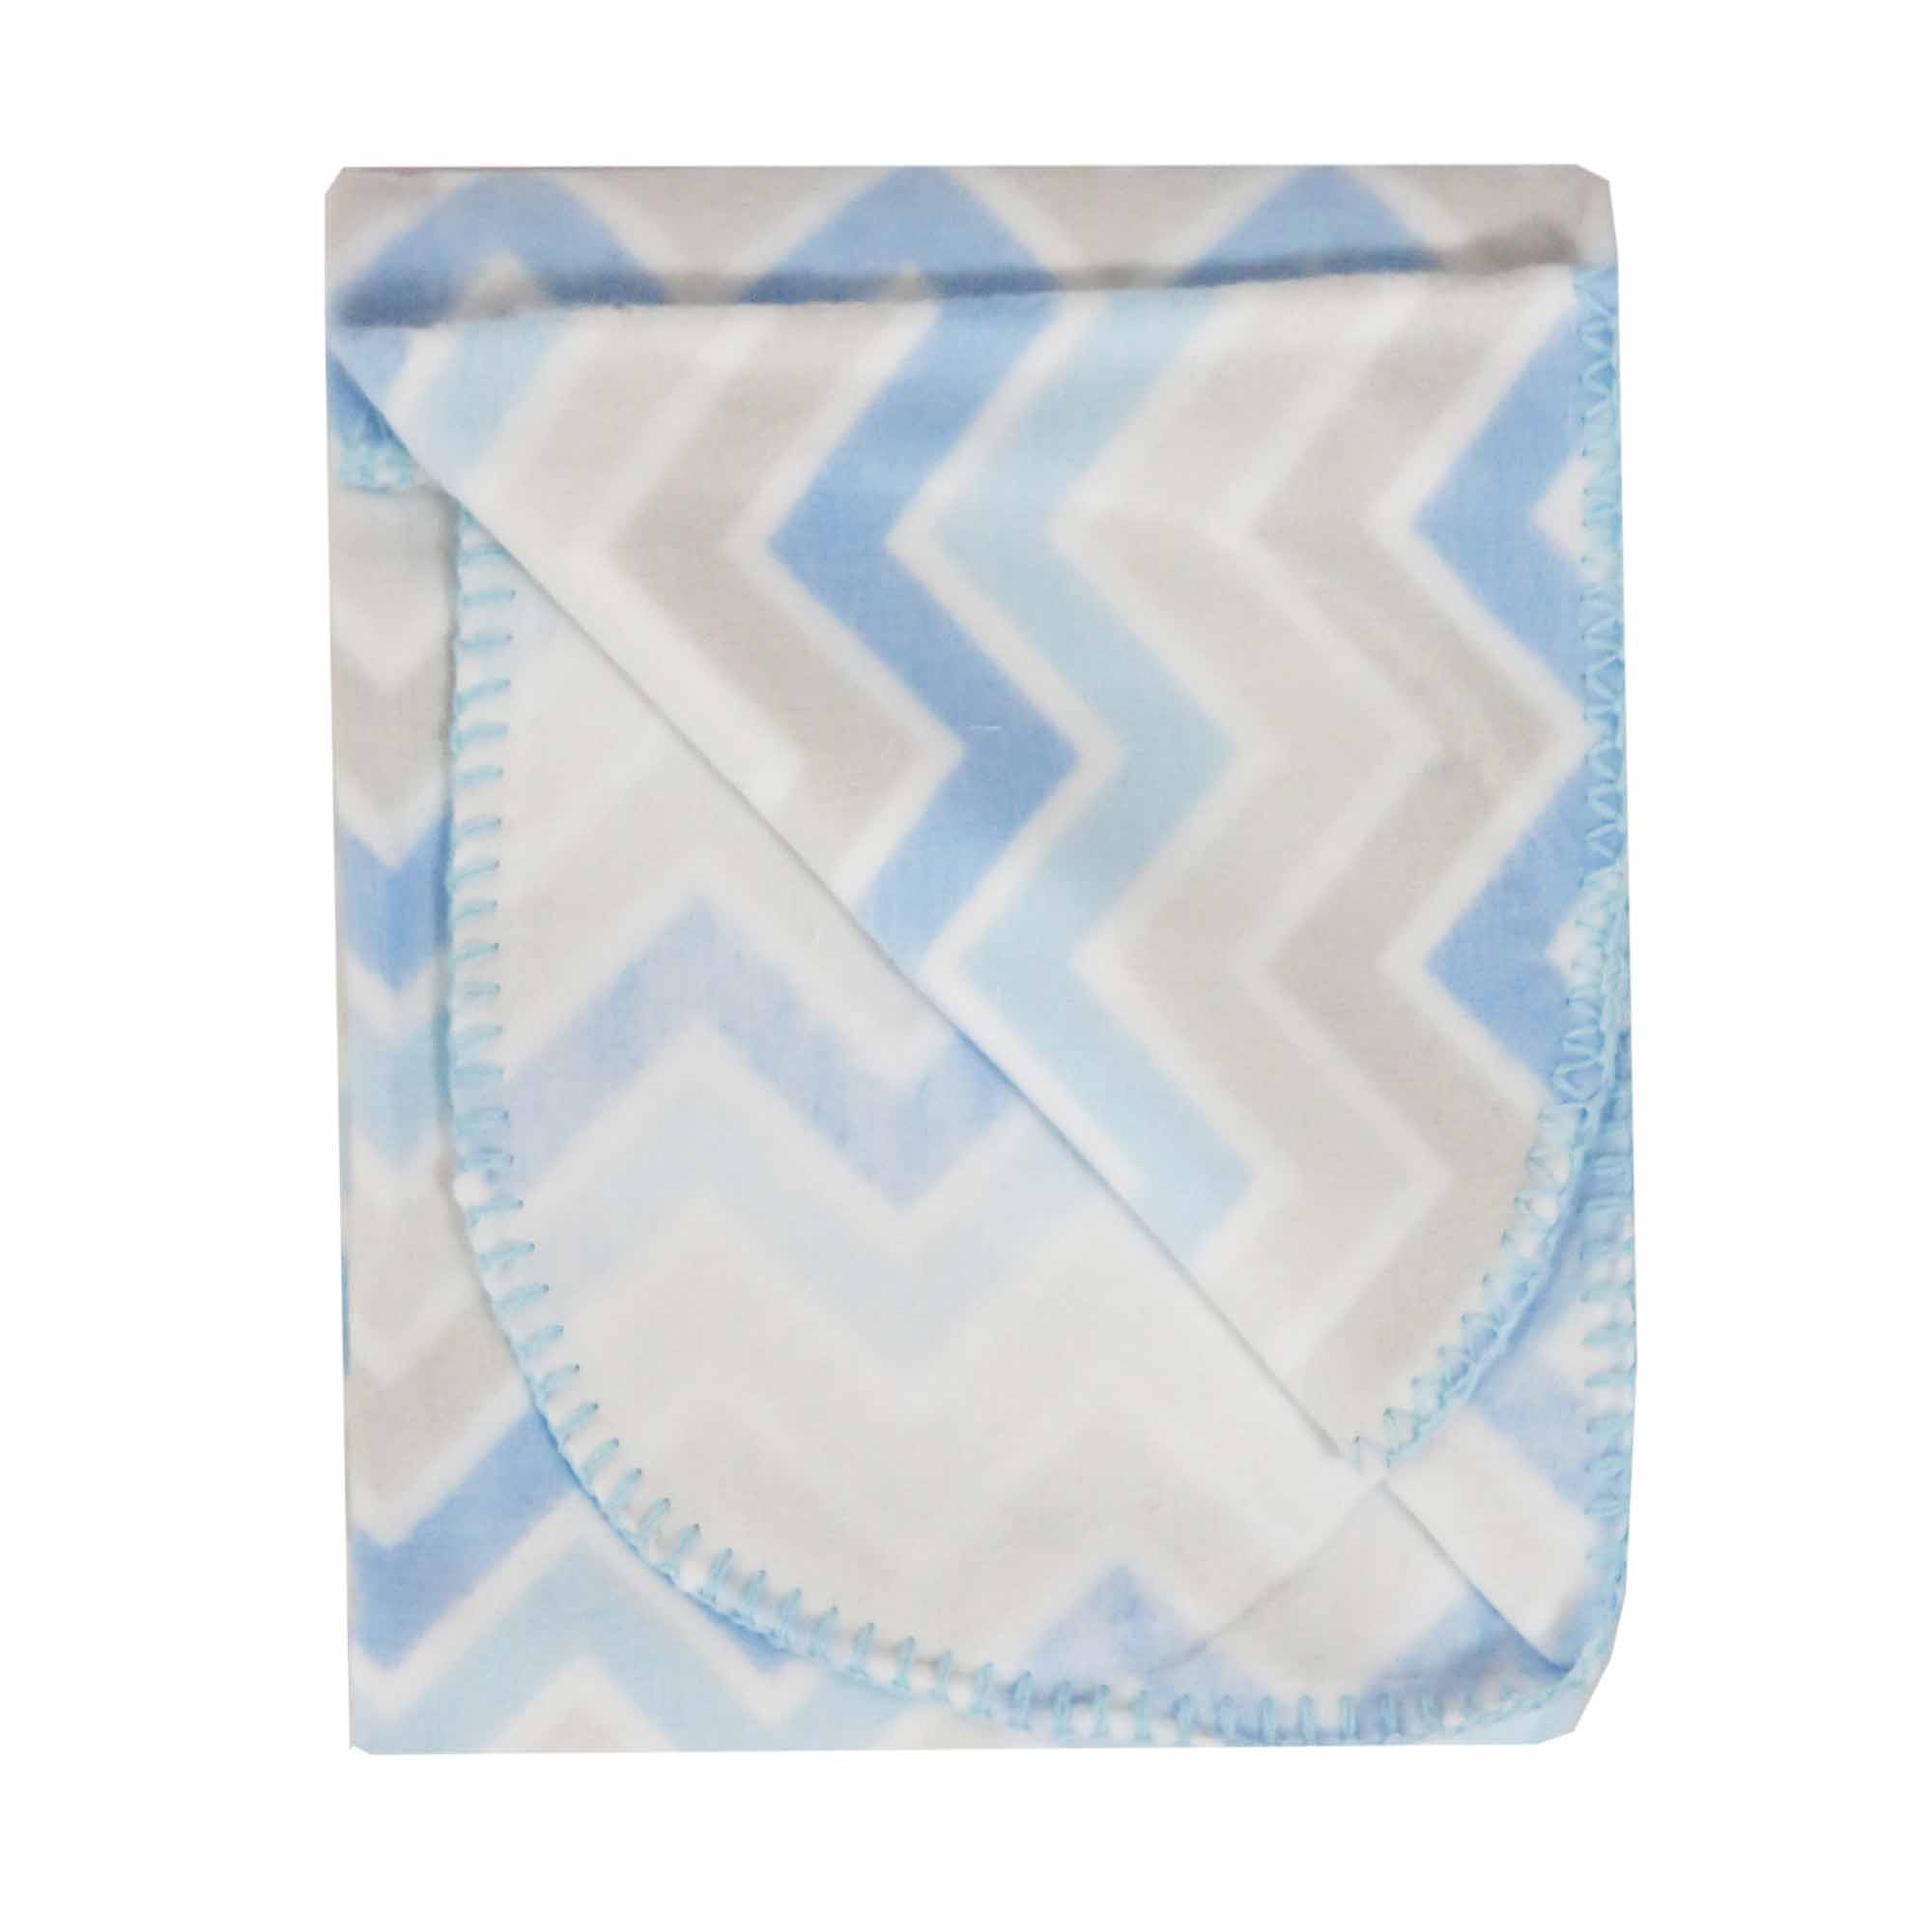 Cobertor Estampado 90x110 - Minasrey - Loupiot Classic